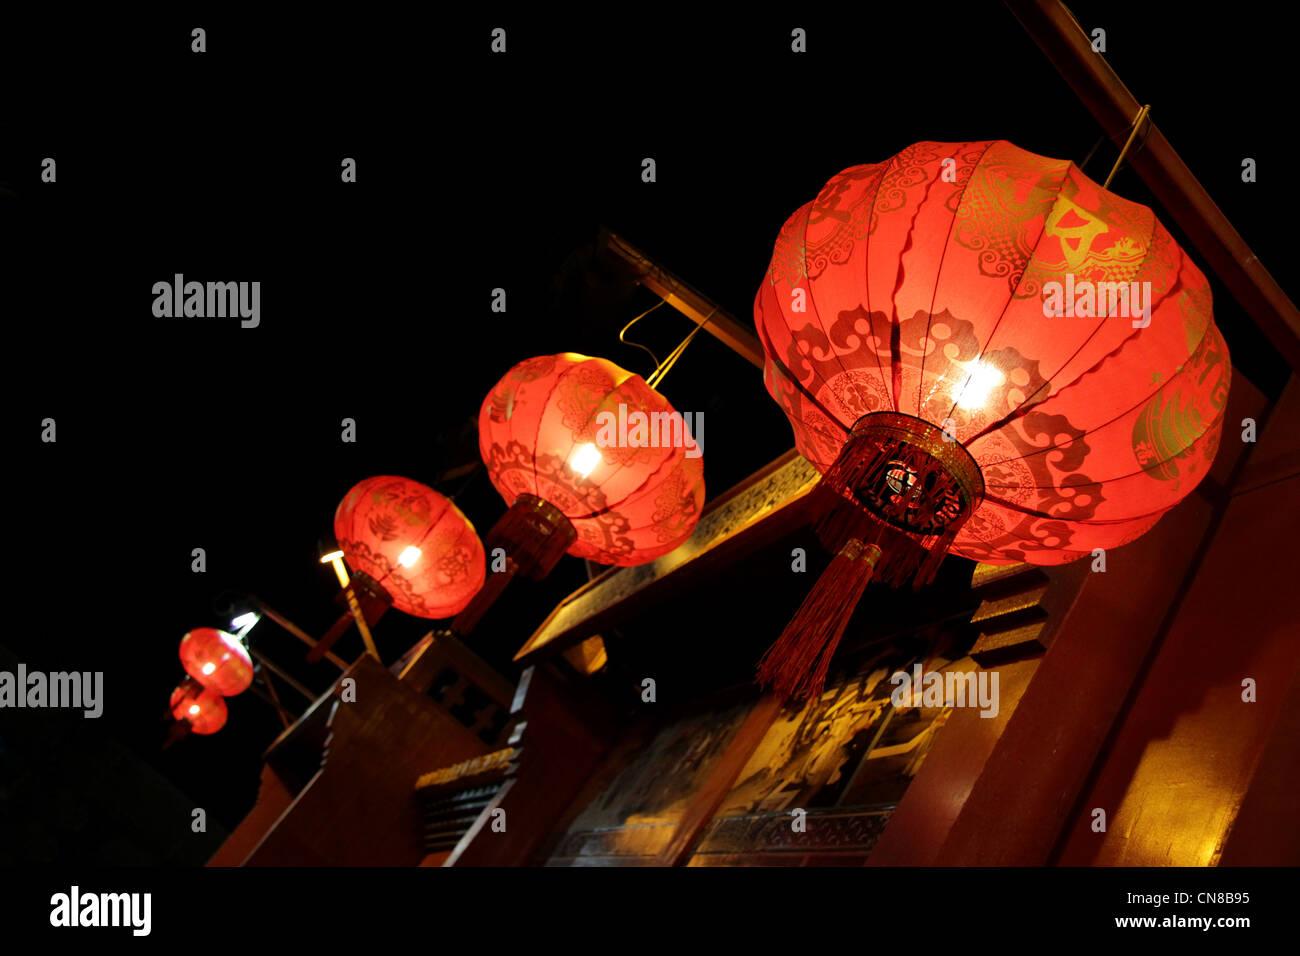 Lampade Cinesi Di Carta.Lanterna Di Carta Lampade Cinesi Foto Immagine Stock